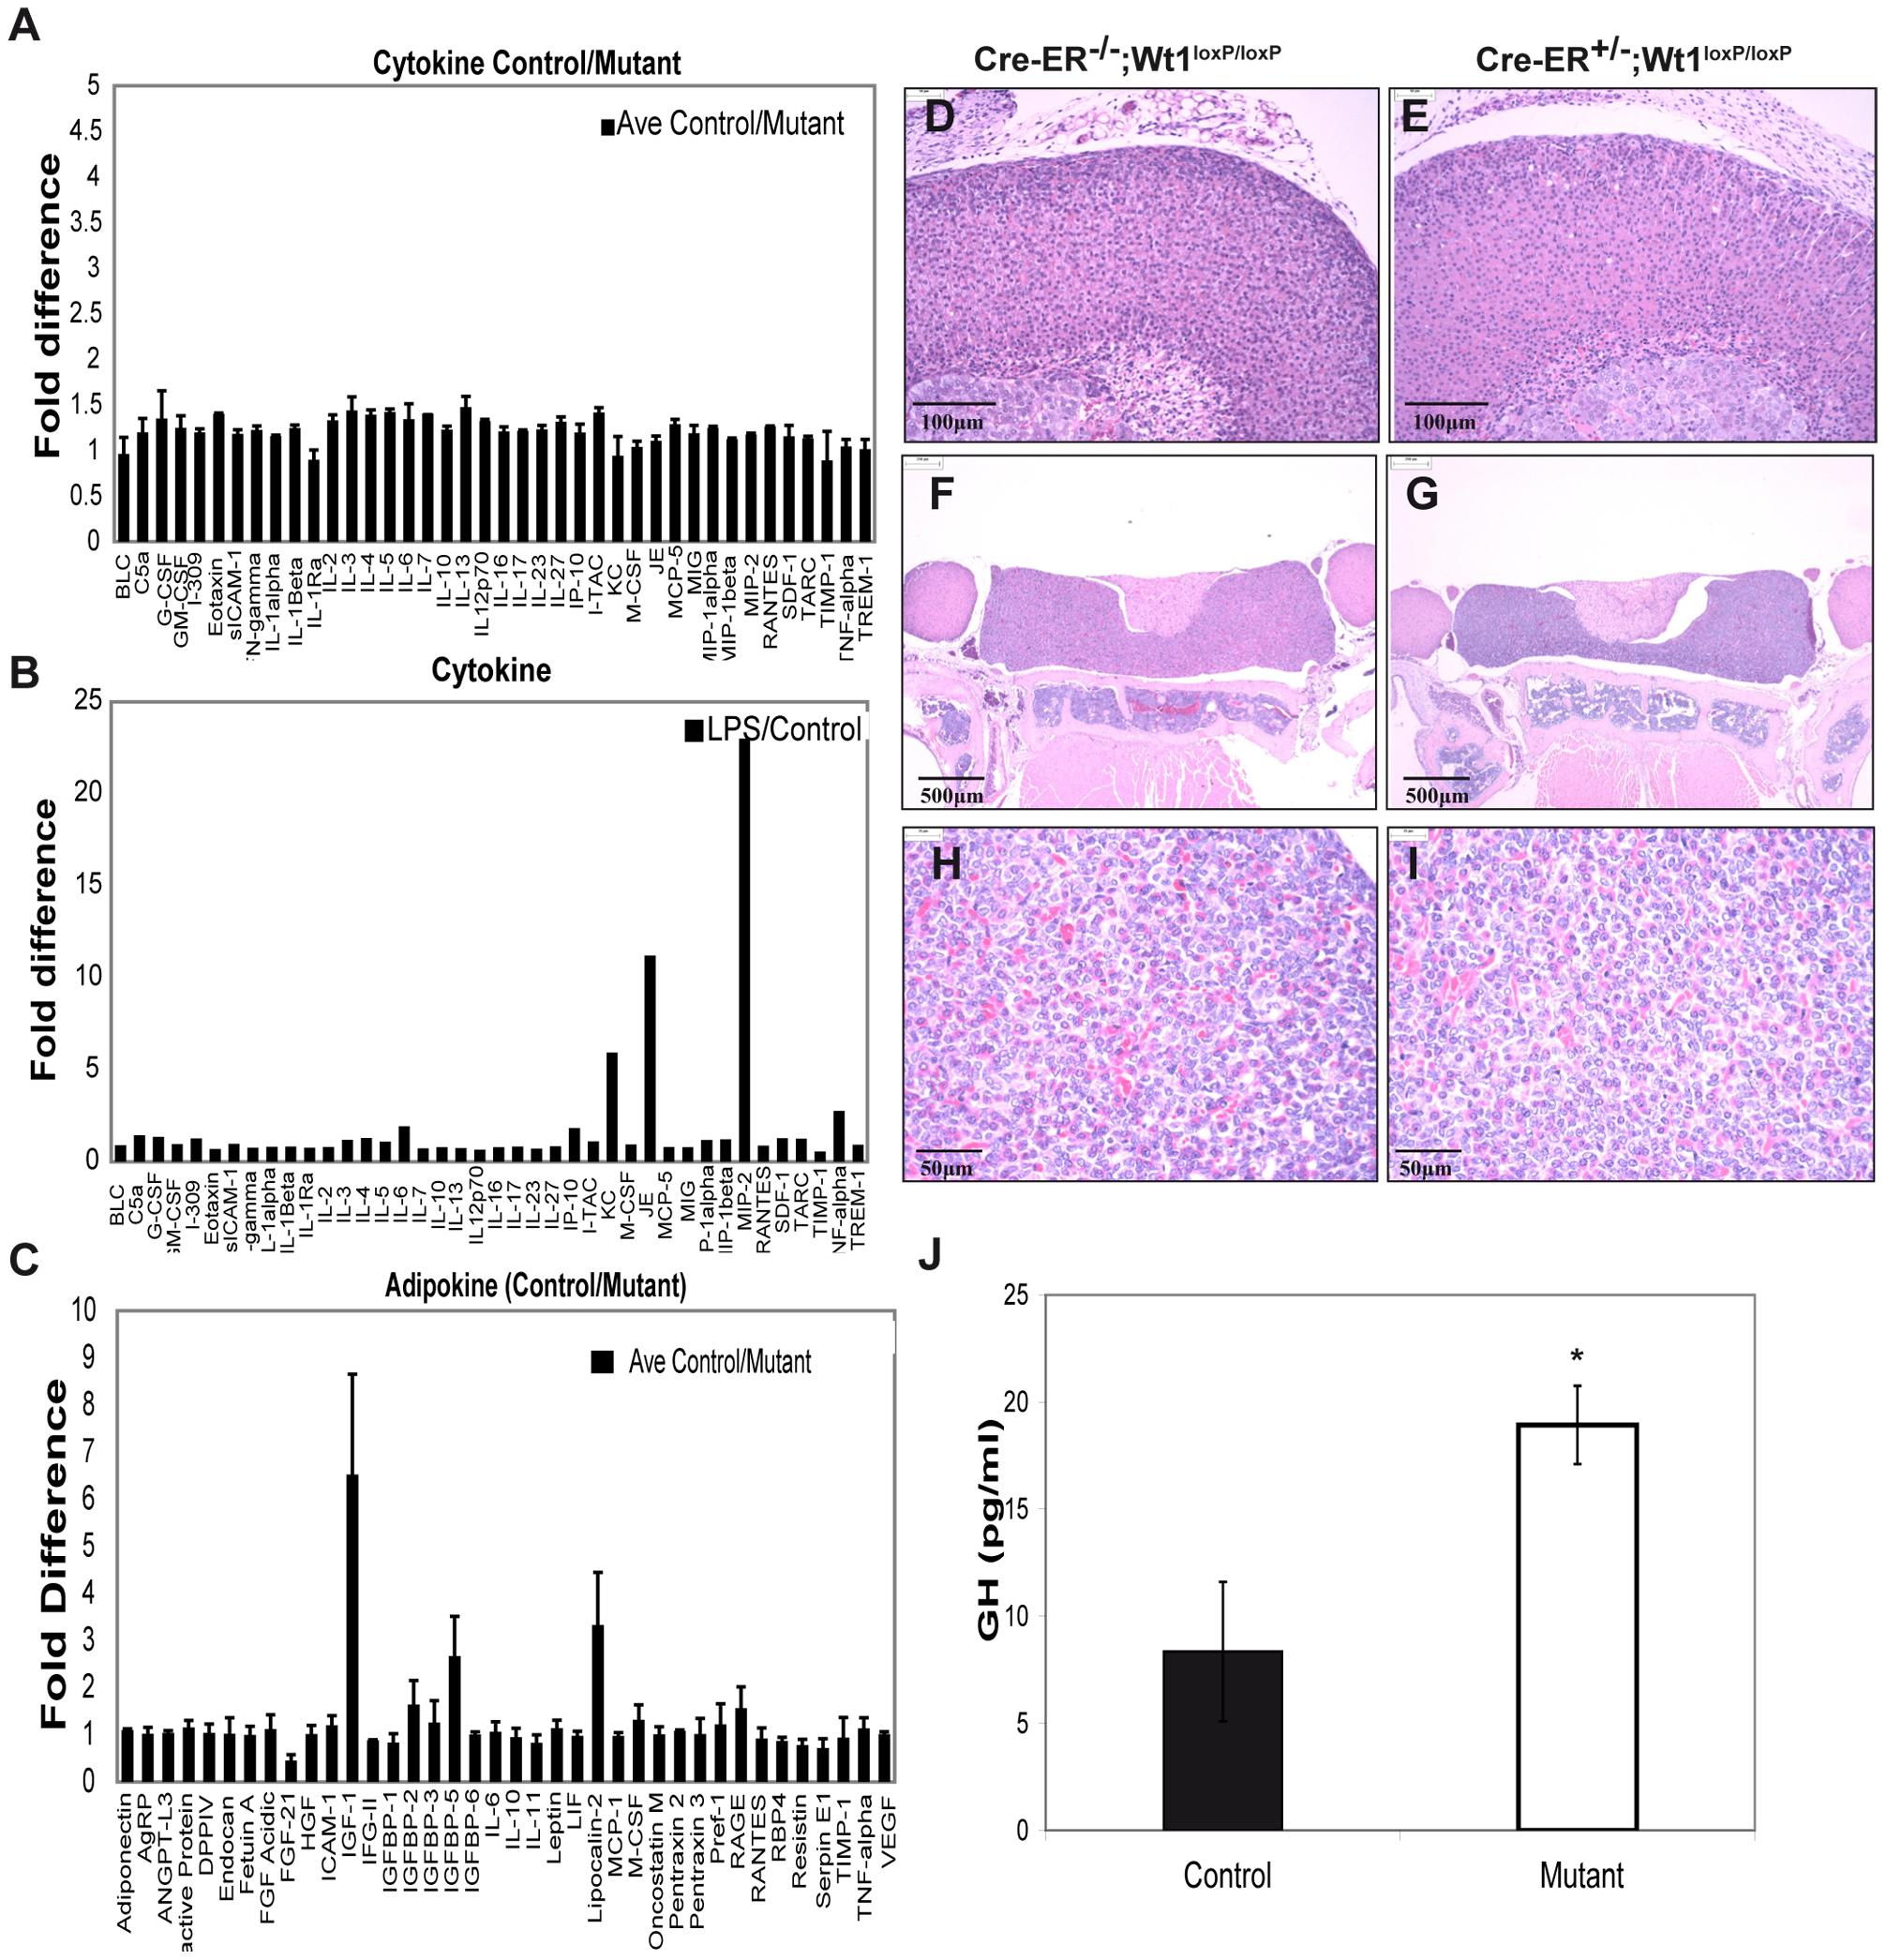 Cytokine, adipokine, and growth hormone analysis in control and mutant plasma.